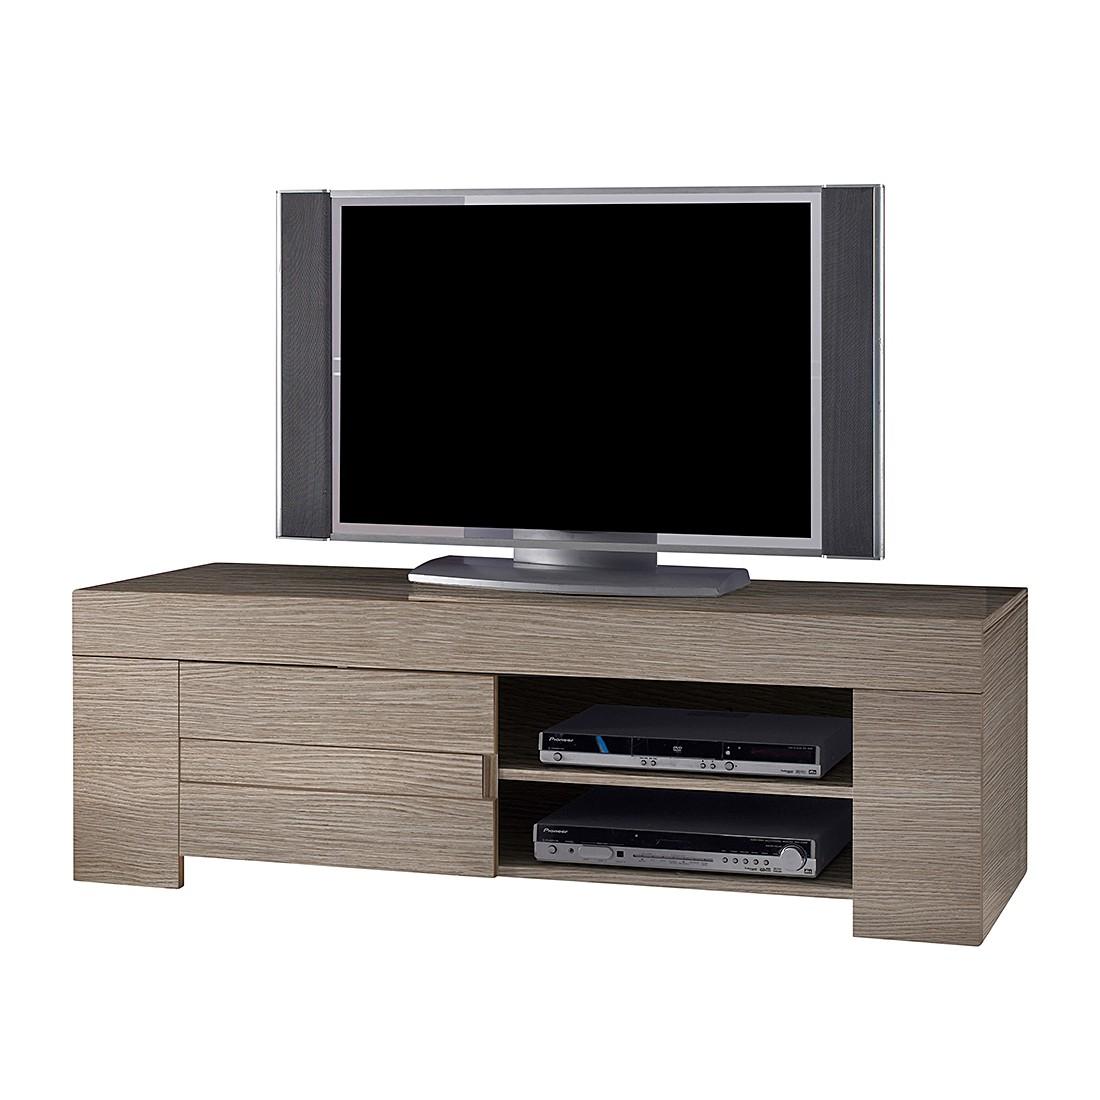 Meuble TV Gladiolo - Chêne gris, Lc Mobili